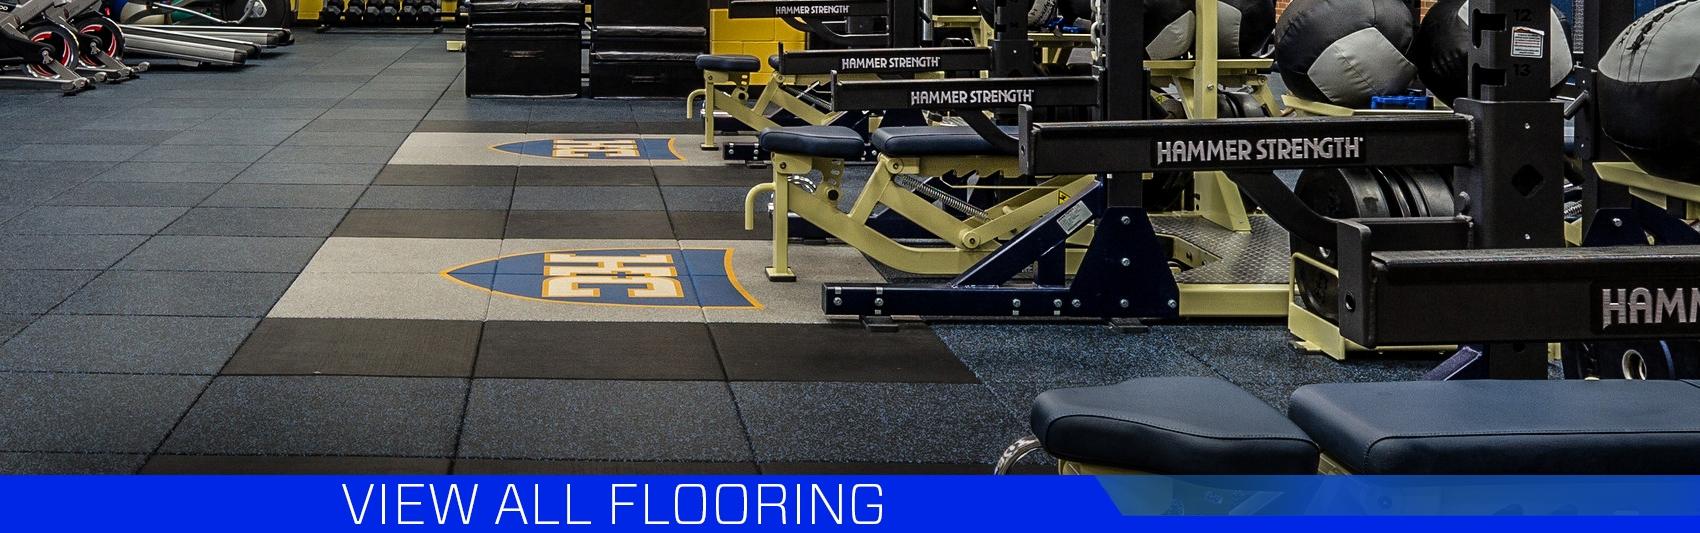 Shop All Flooring Equipment